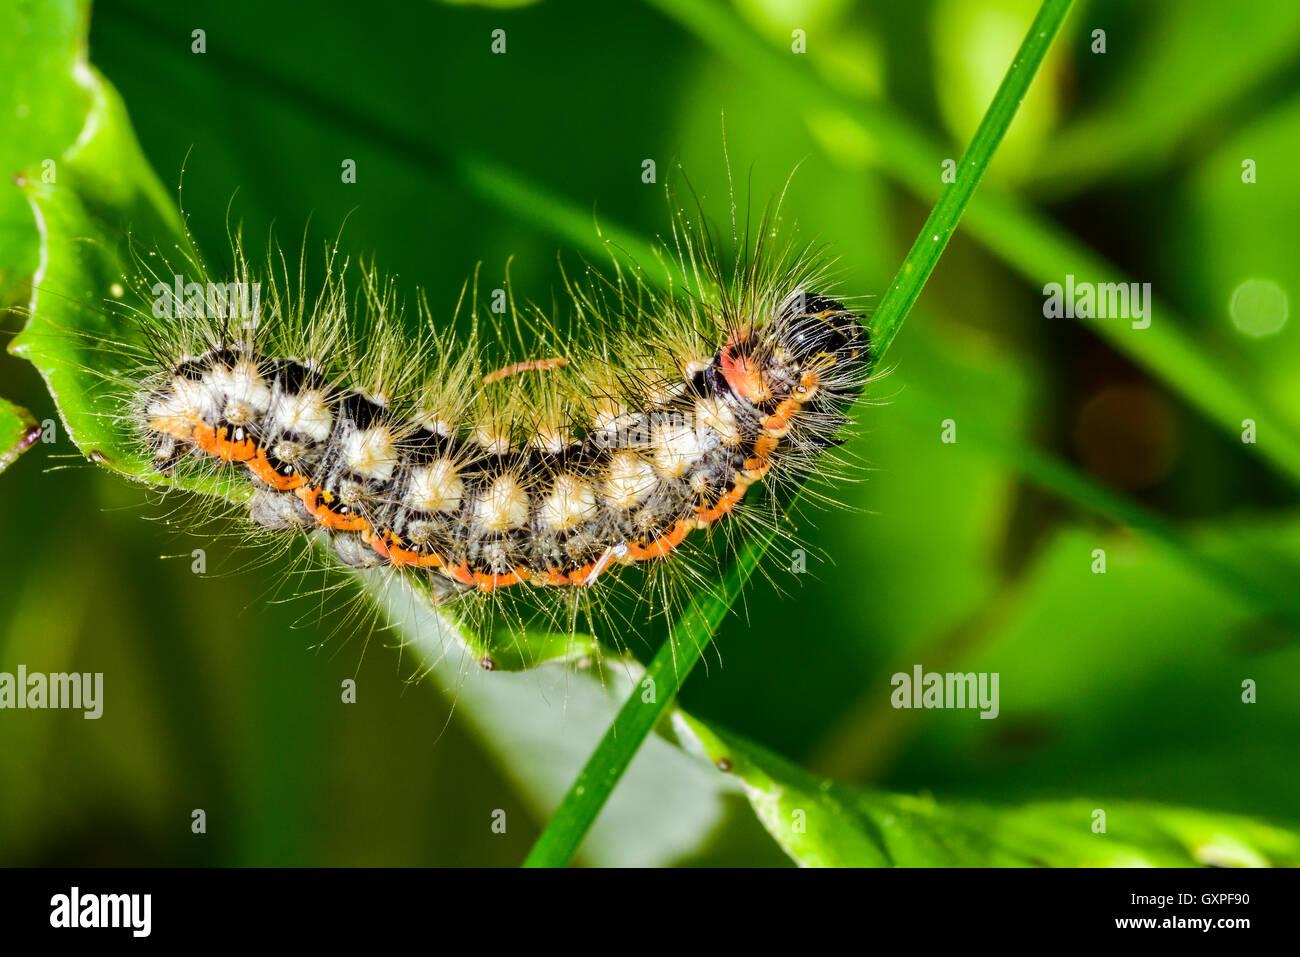 Caterpillar mariposas Imagen De Stock